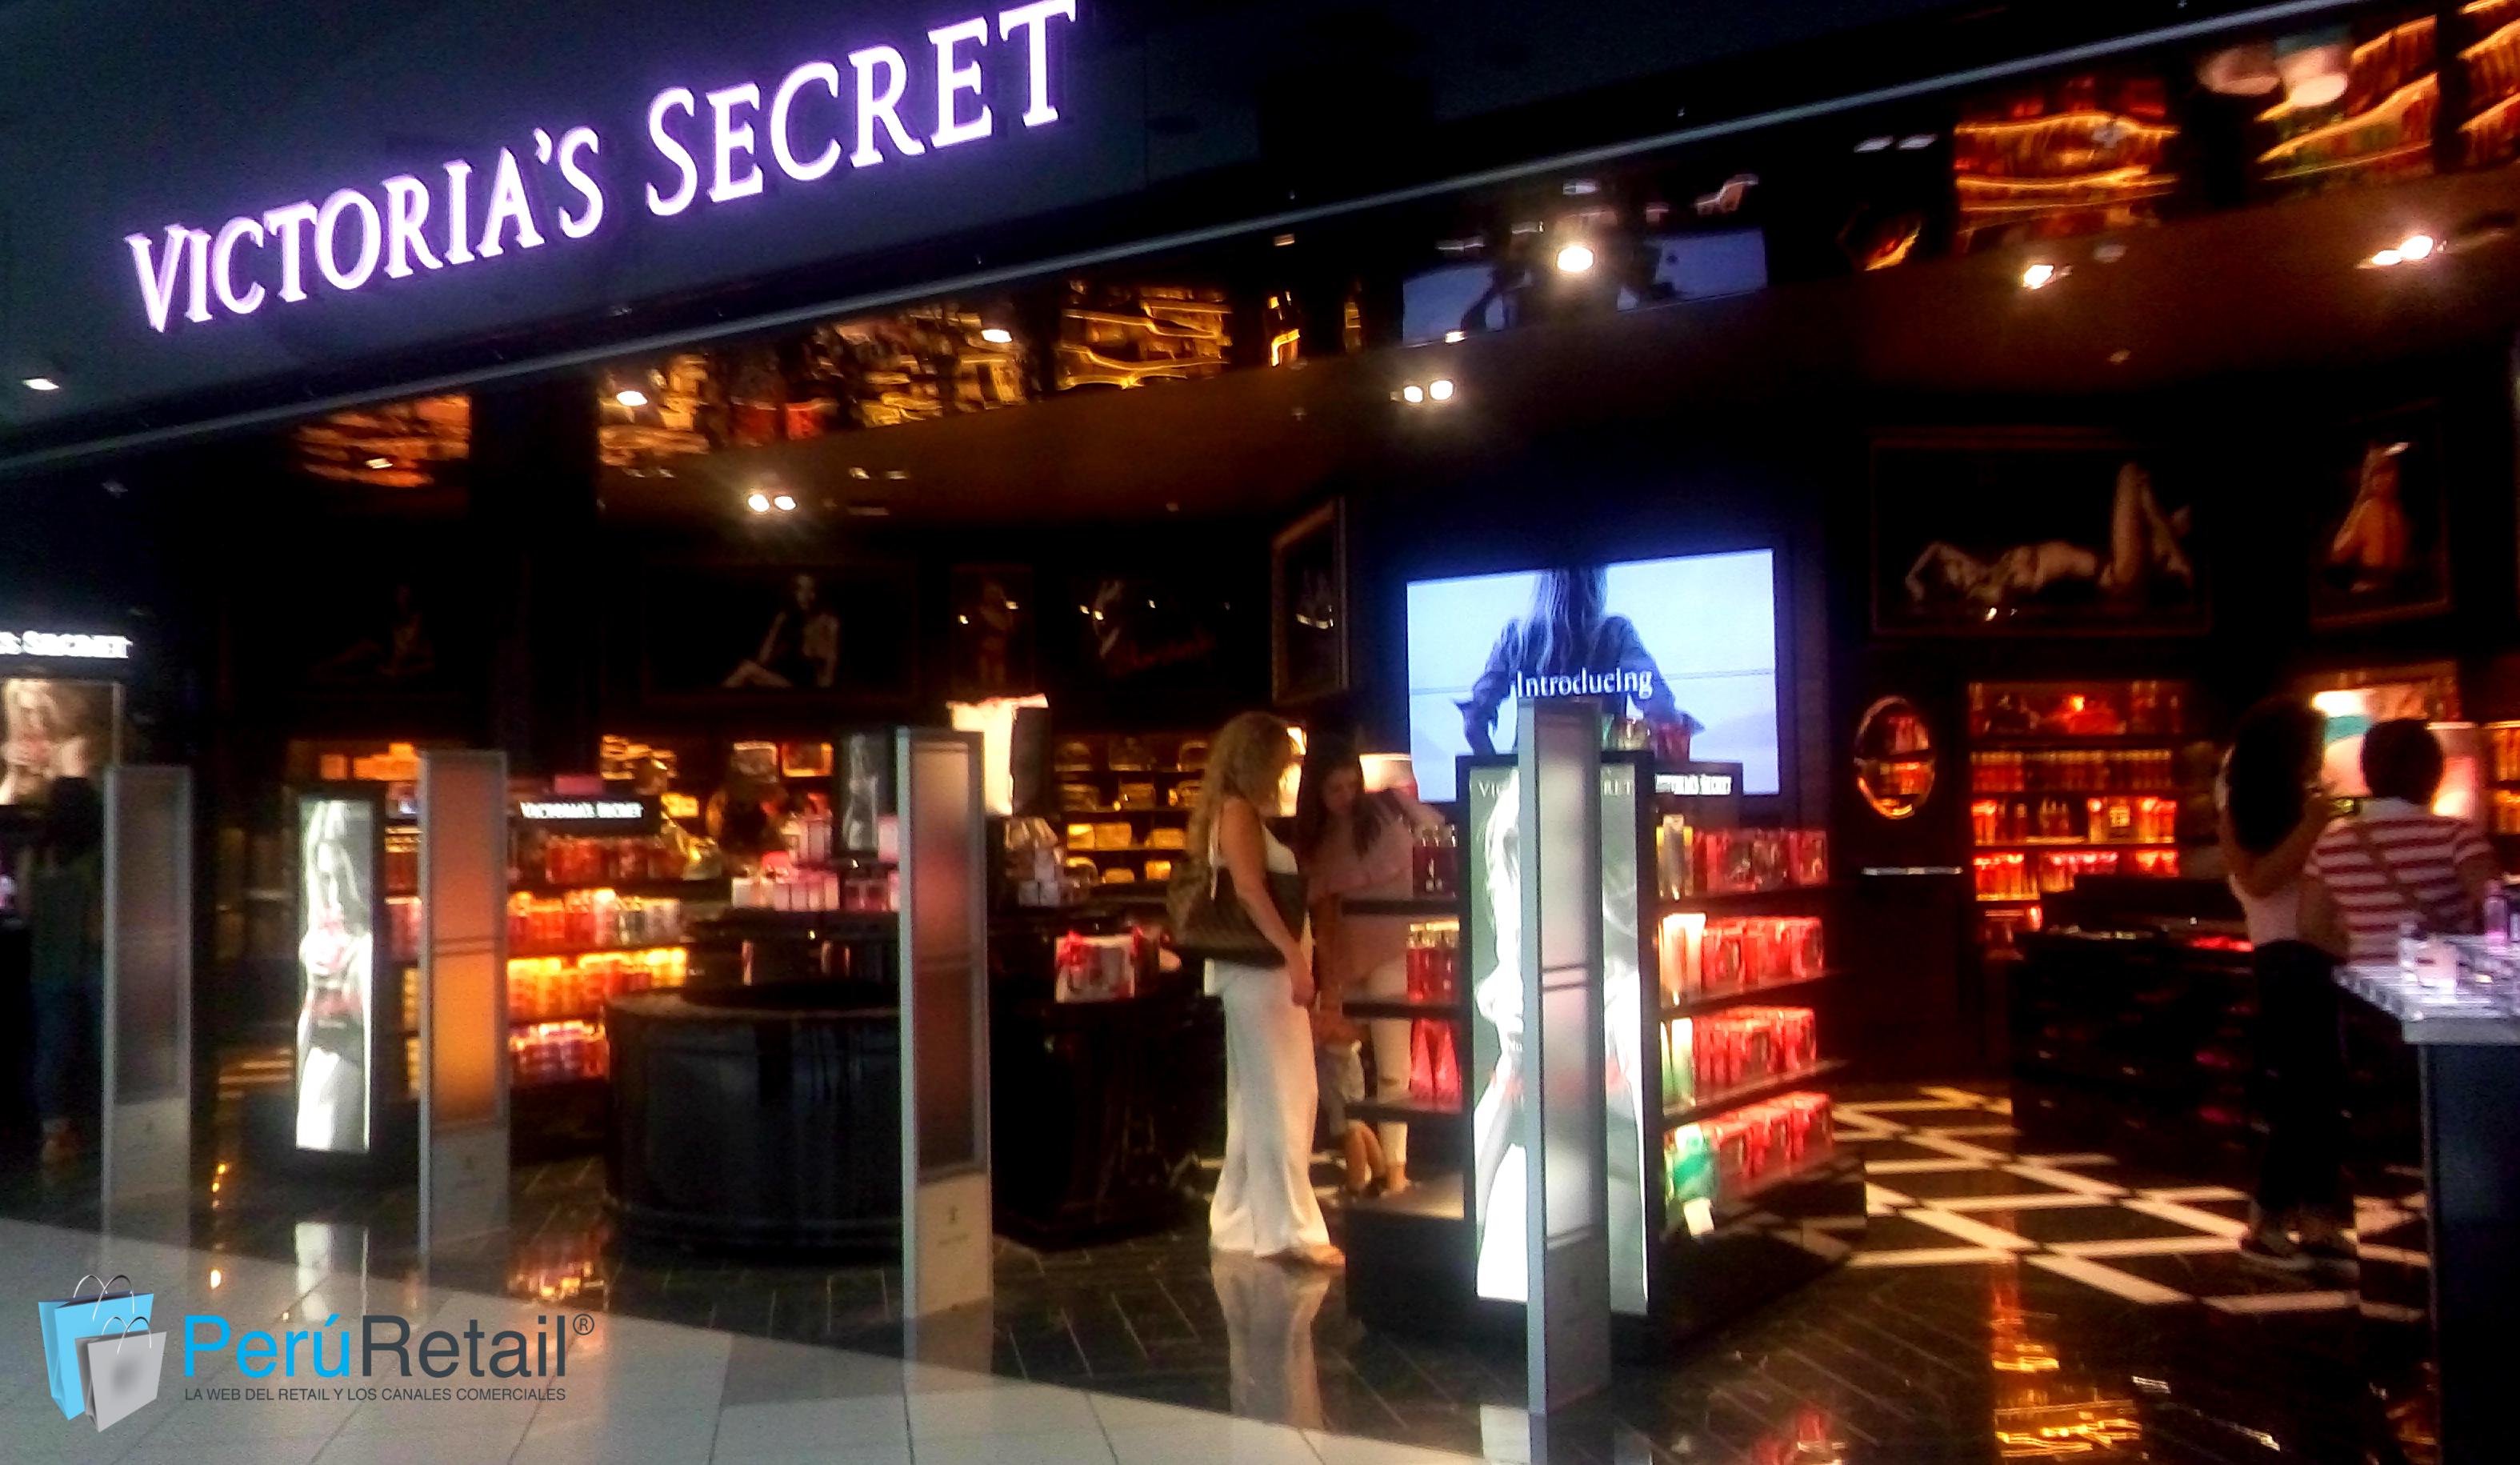 victorias secret 3 peru retail - Victoria's Secret planea abrir una tienda 'full concept' en el Jockey Plaza